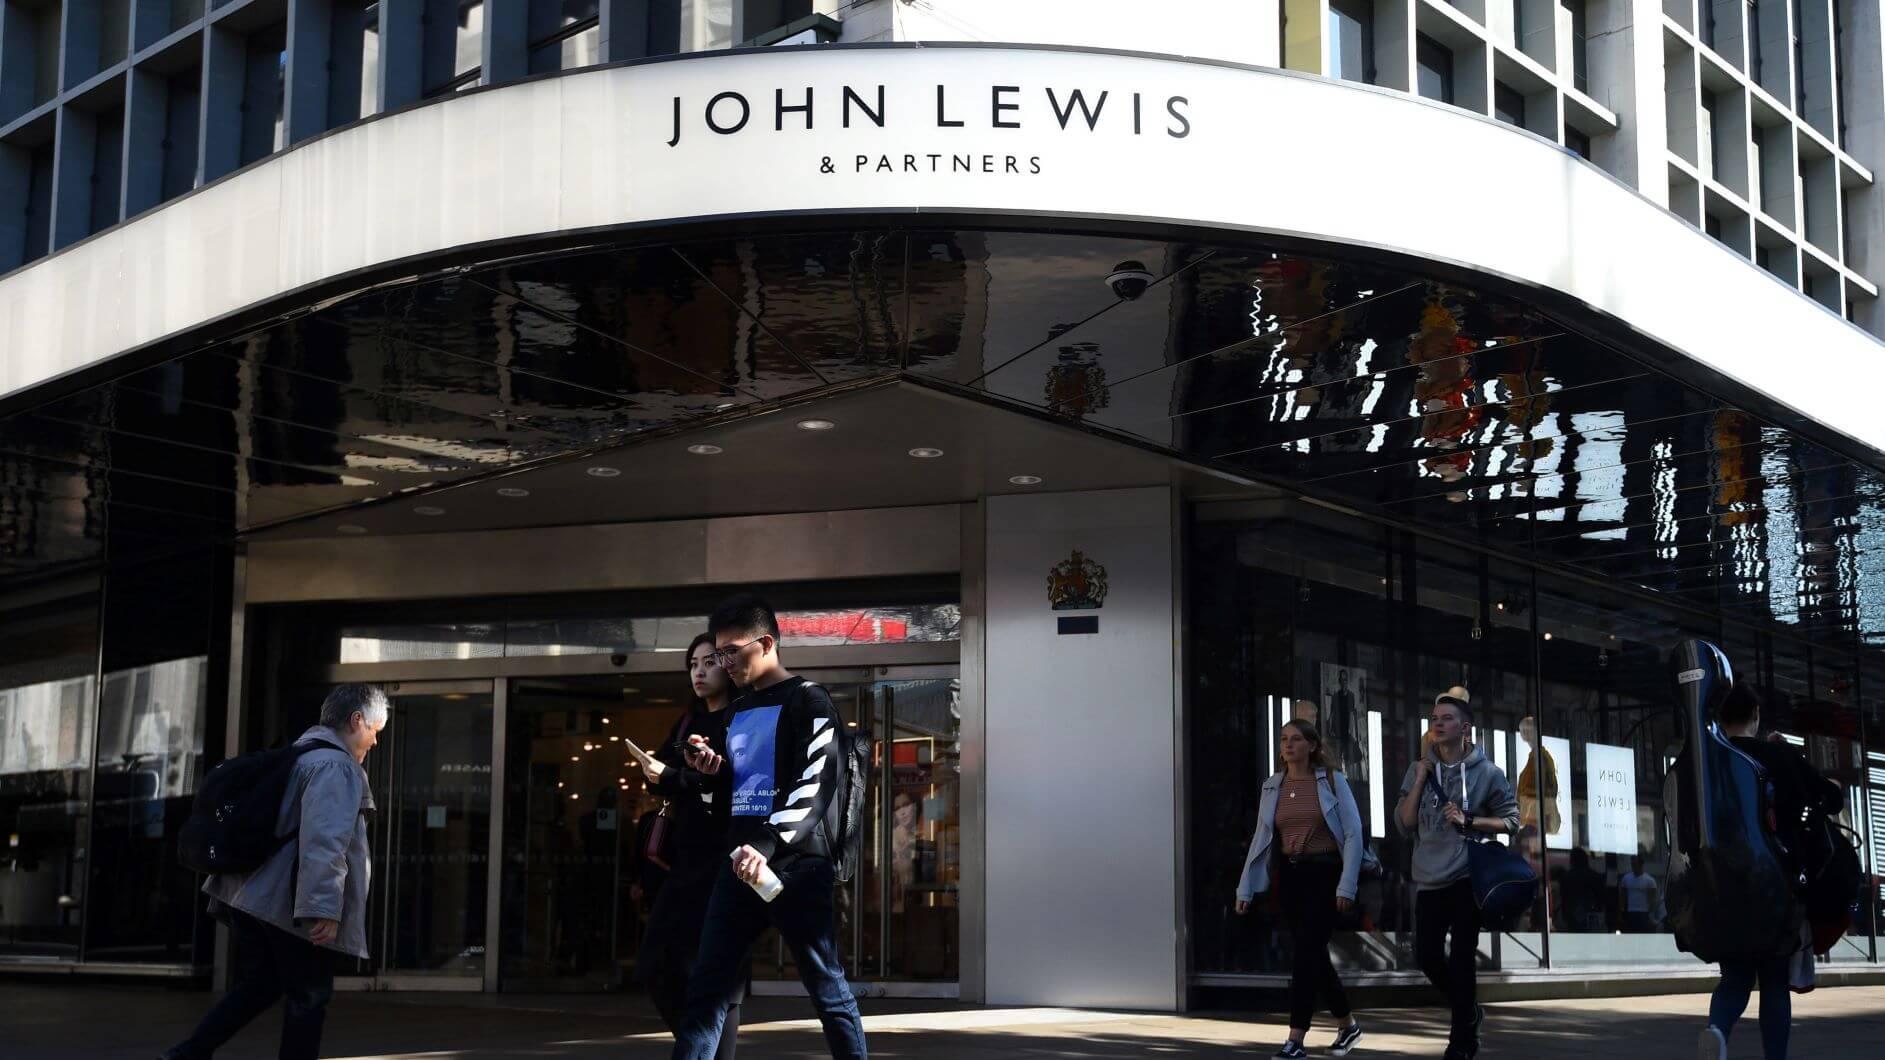 John Lewis Sounds Alarm Over No-Deal Brexit As It Slumps To A Loss